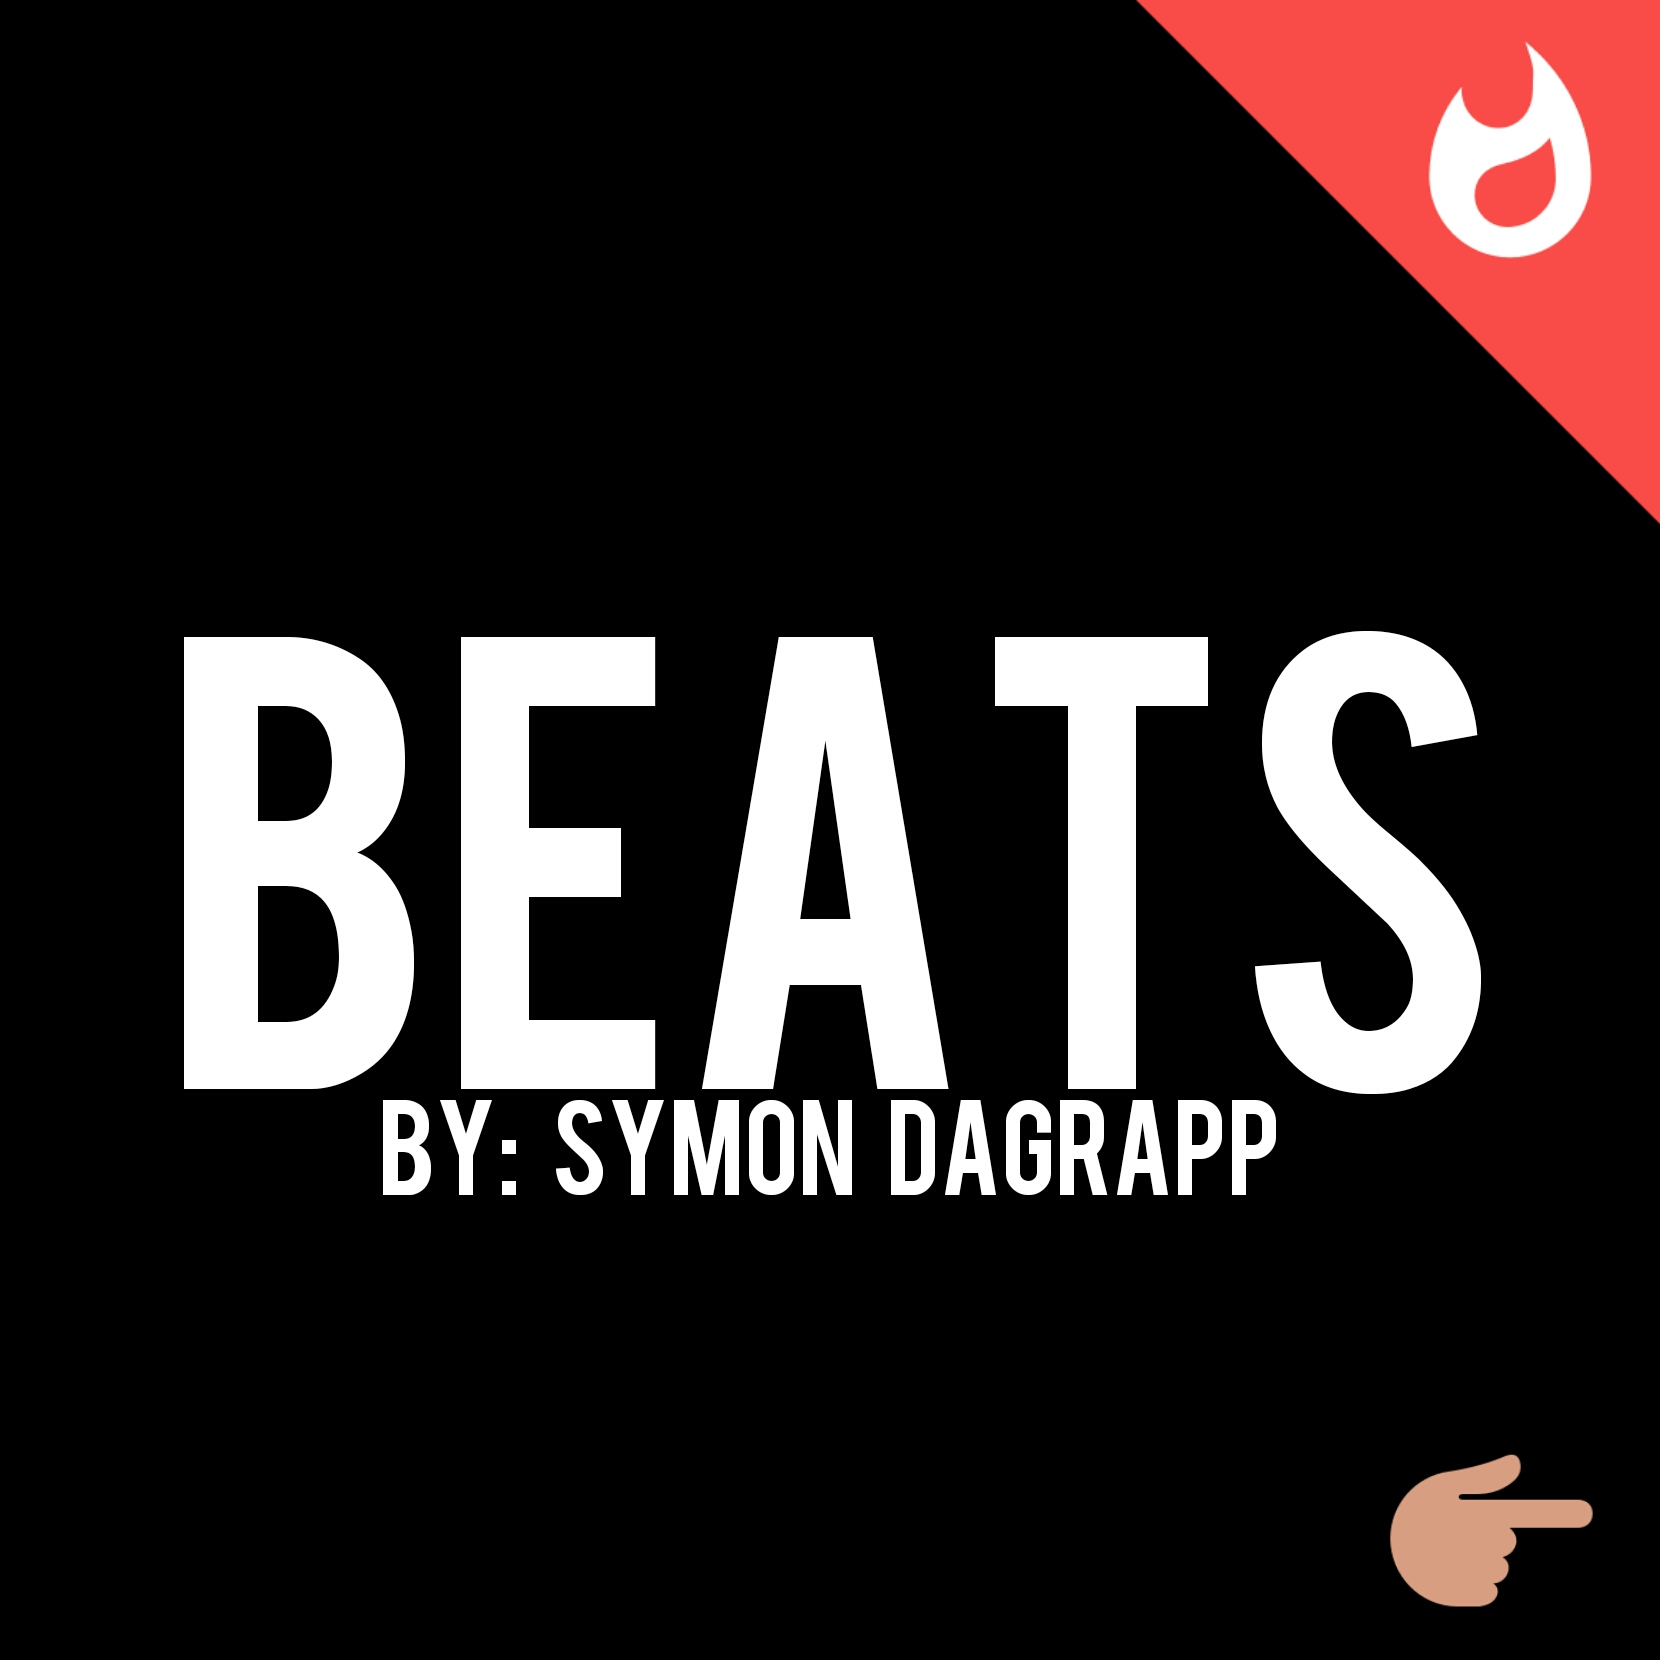 Beats By Symon Dagrapp